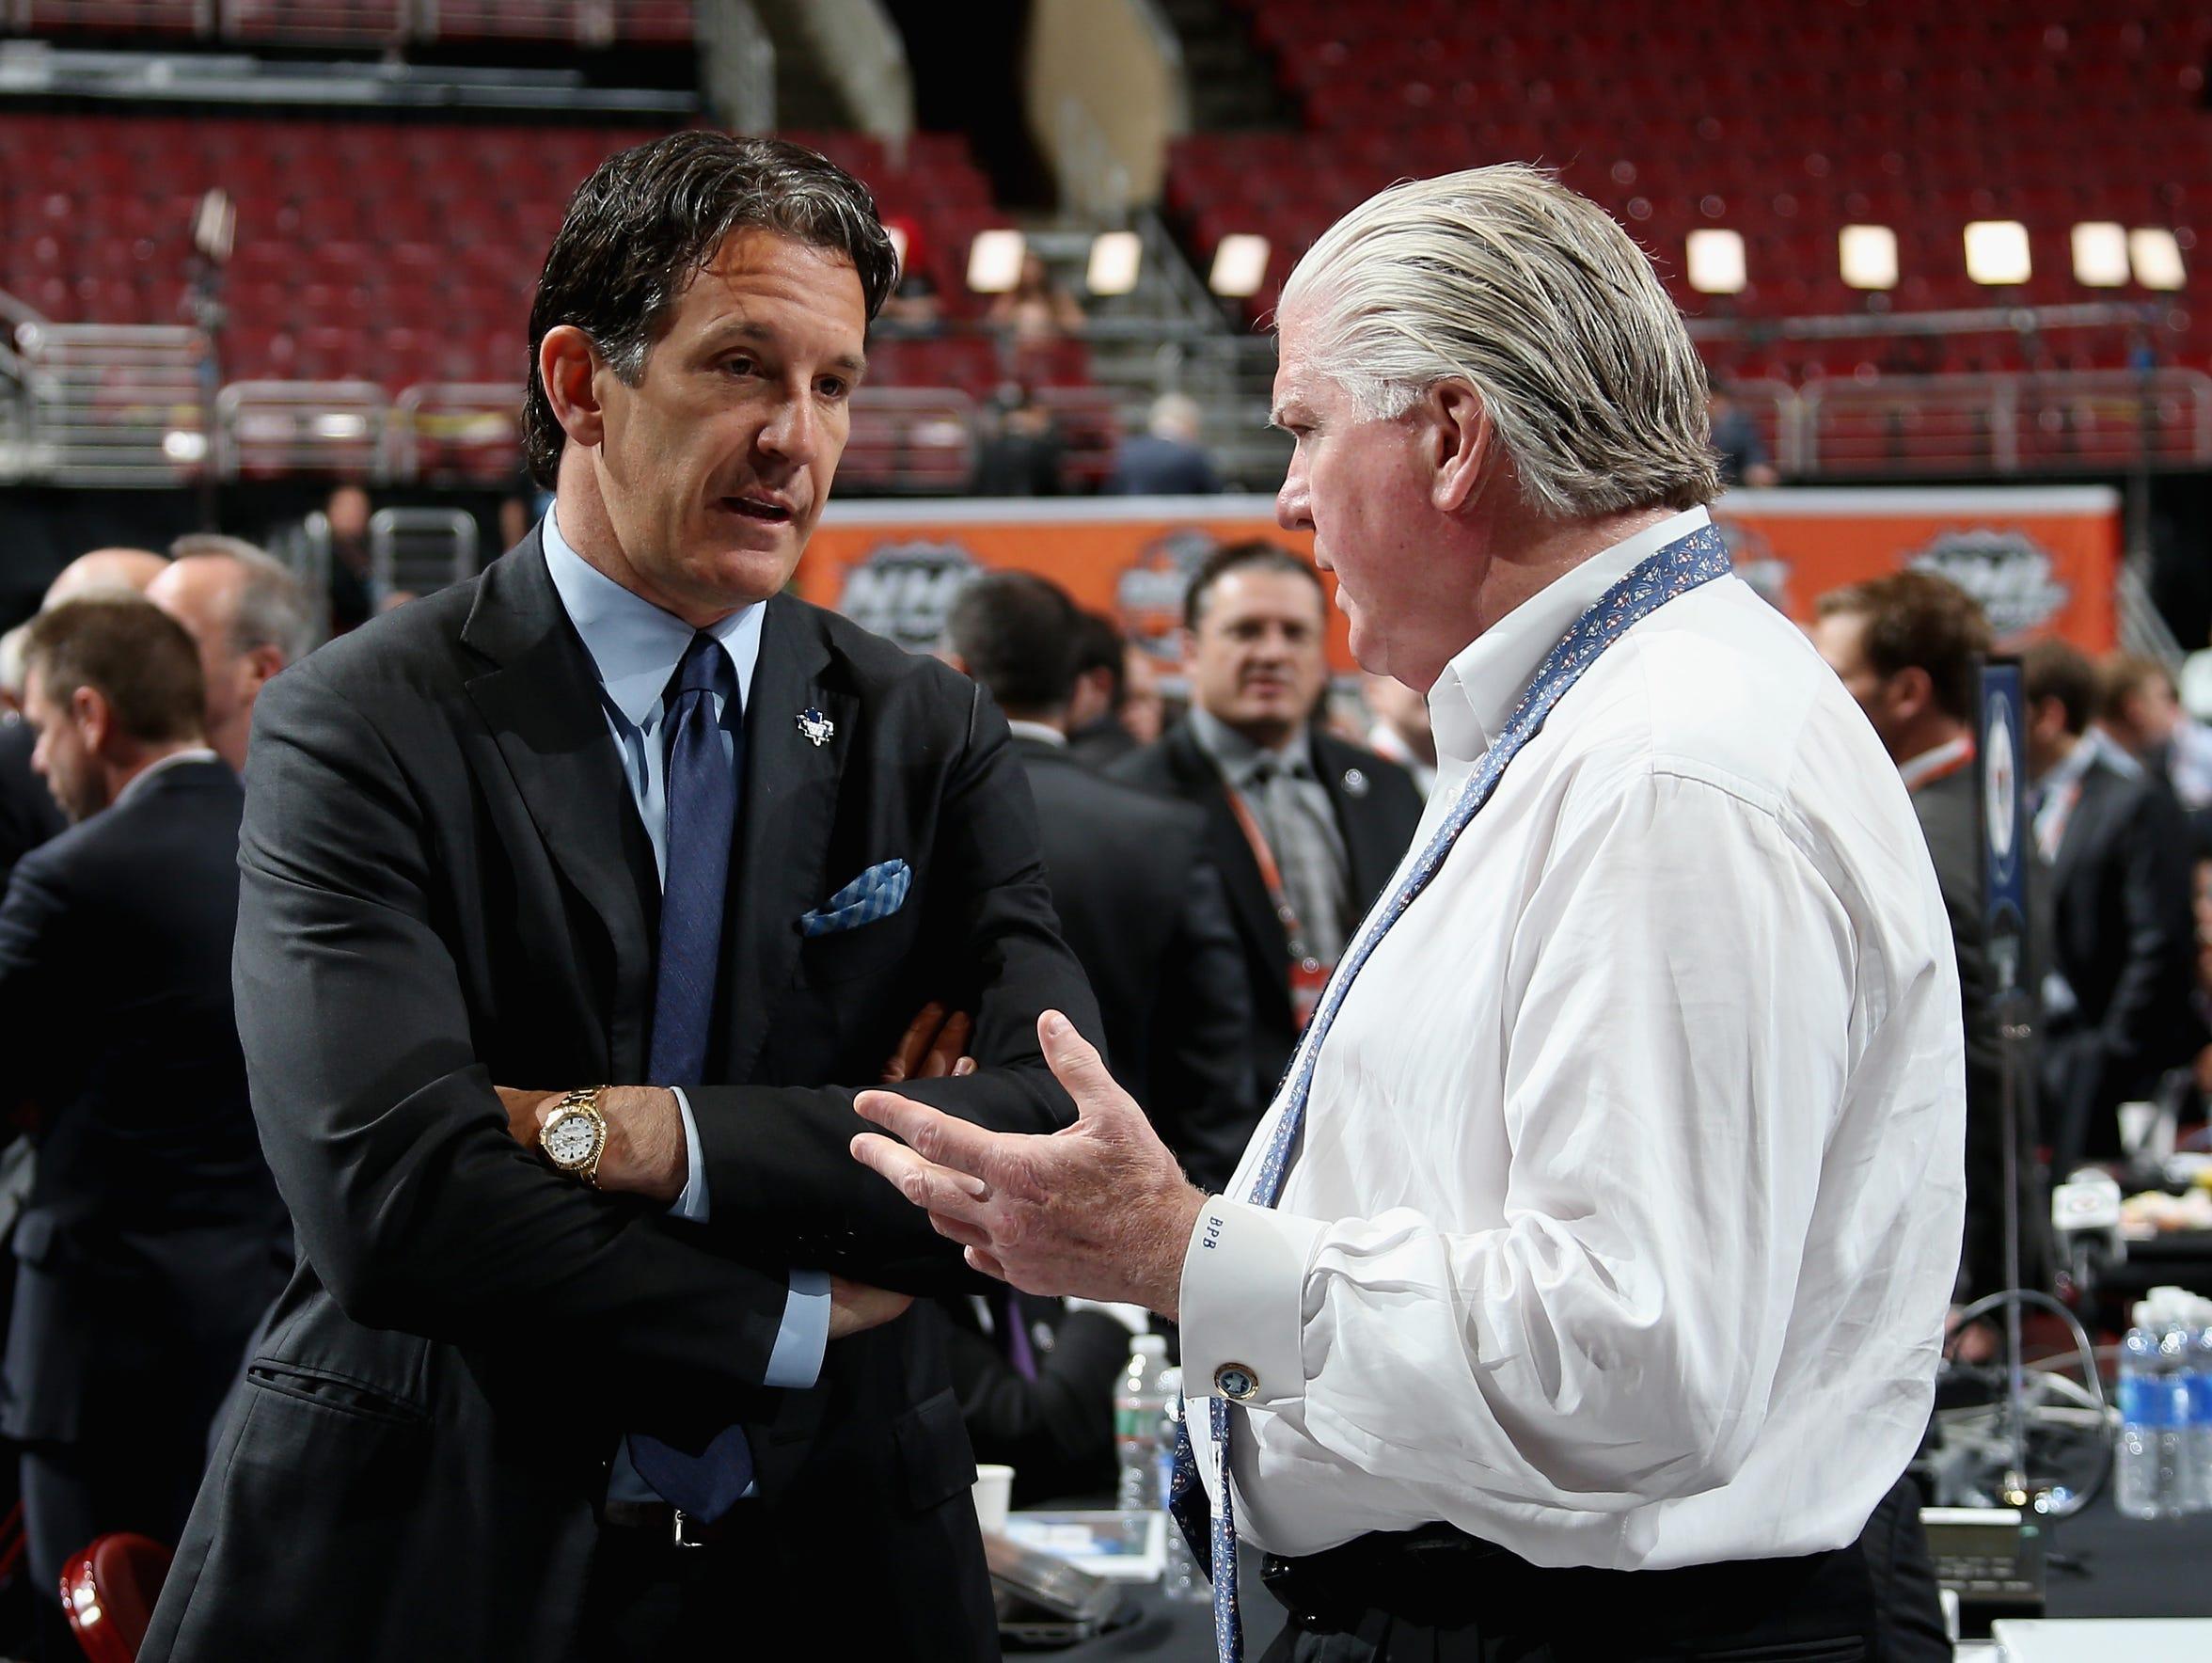 Maple Leafs president Brendan Shanahan (left) and Calgary